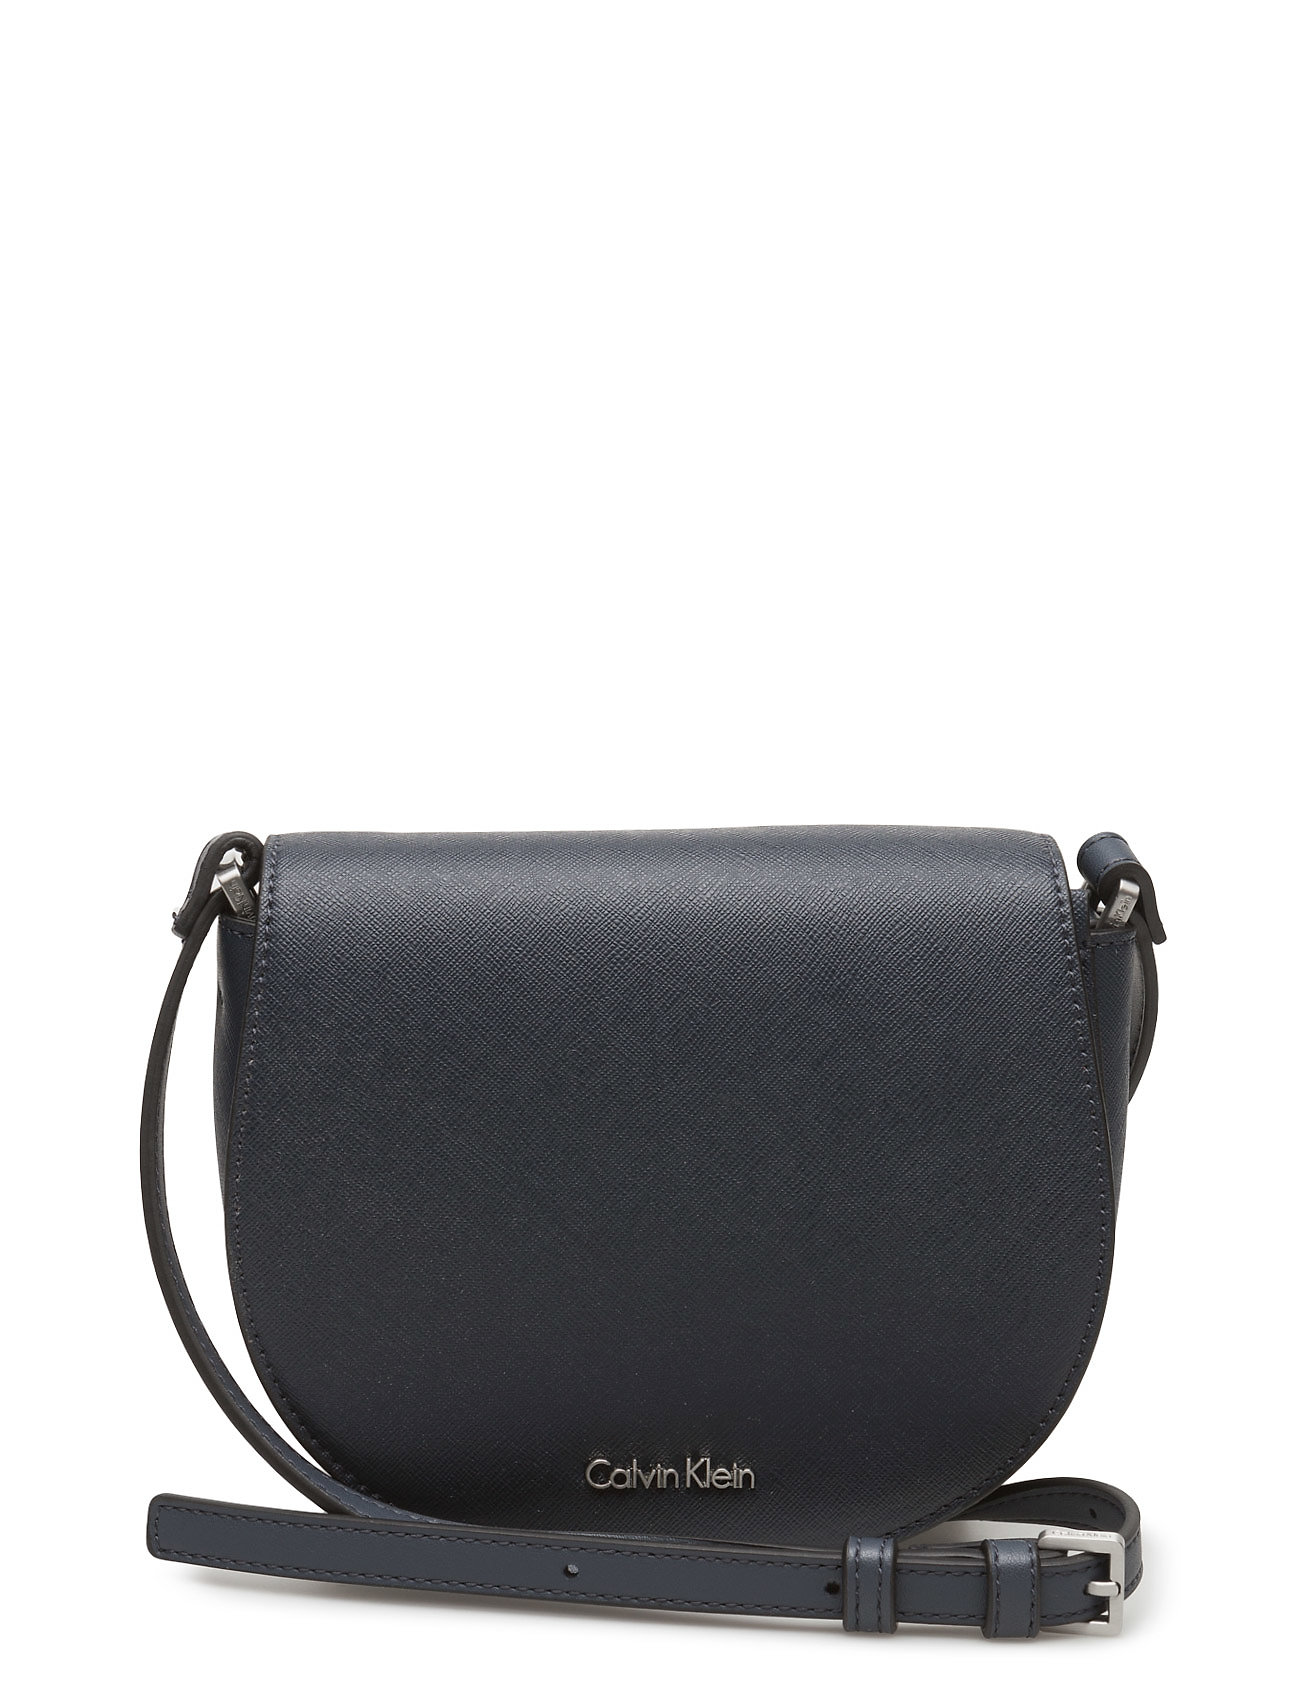 Calvin Klein MARISSA SADDLE BAG,